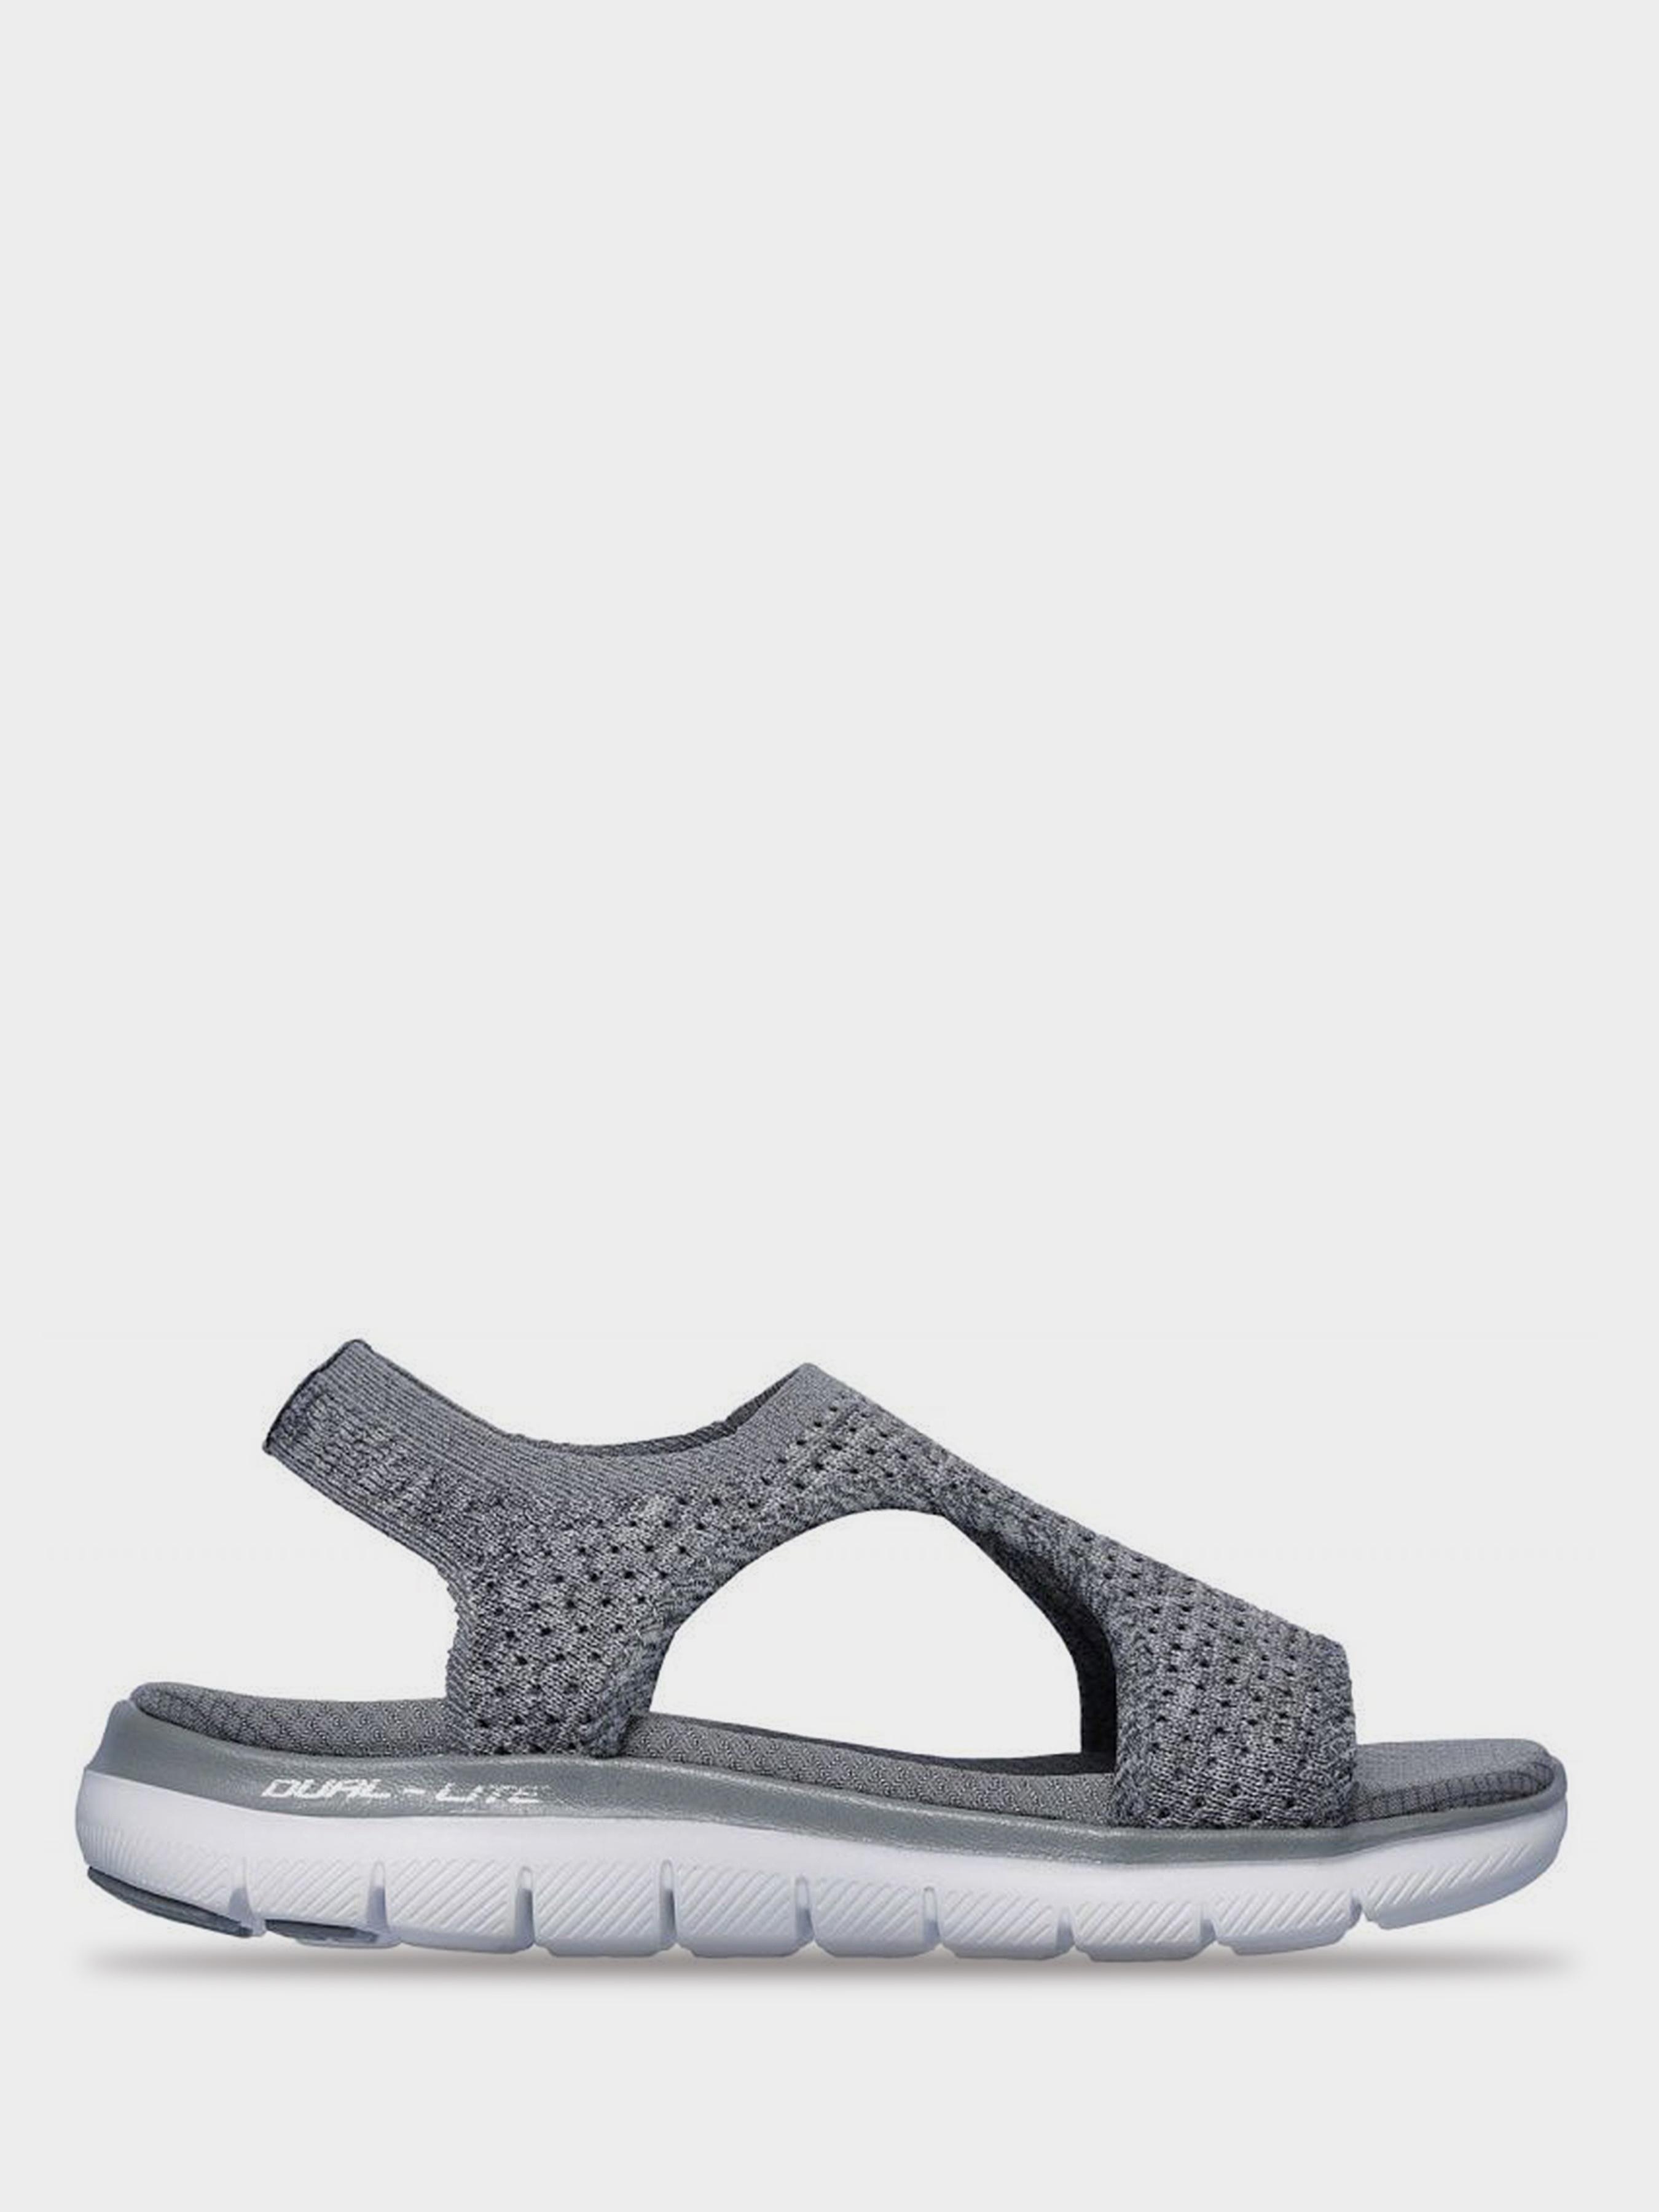 Купить Сандалии женские Skechers KW5020, Серый